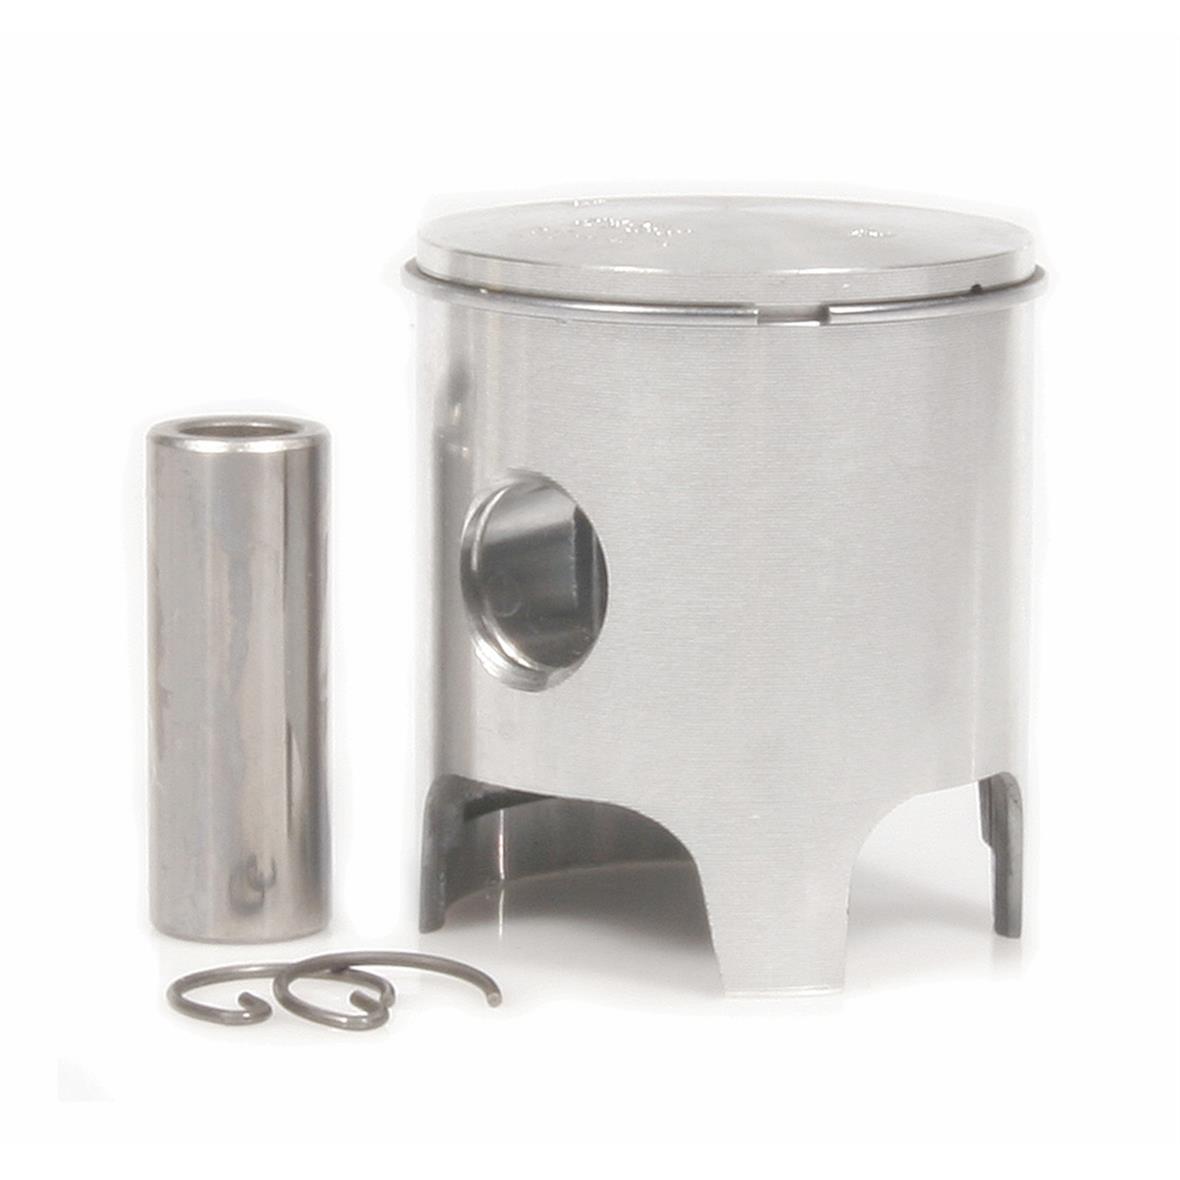 Product Image for 'Piston MALOSSI C 115 ccTitle'